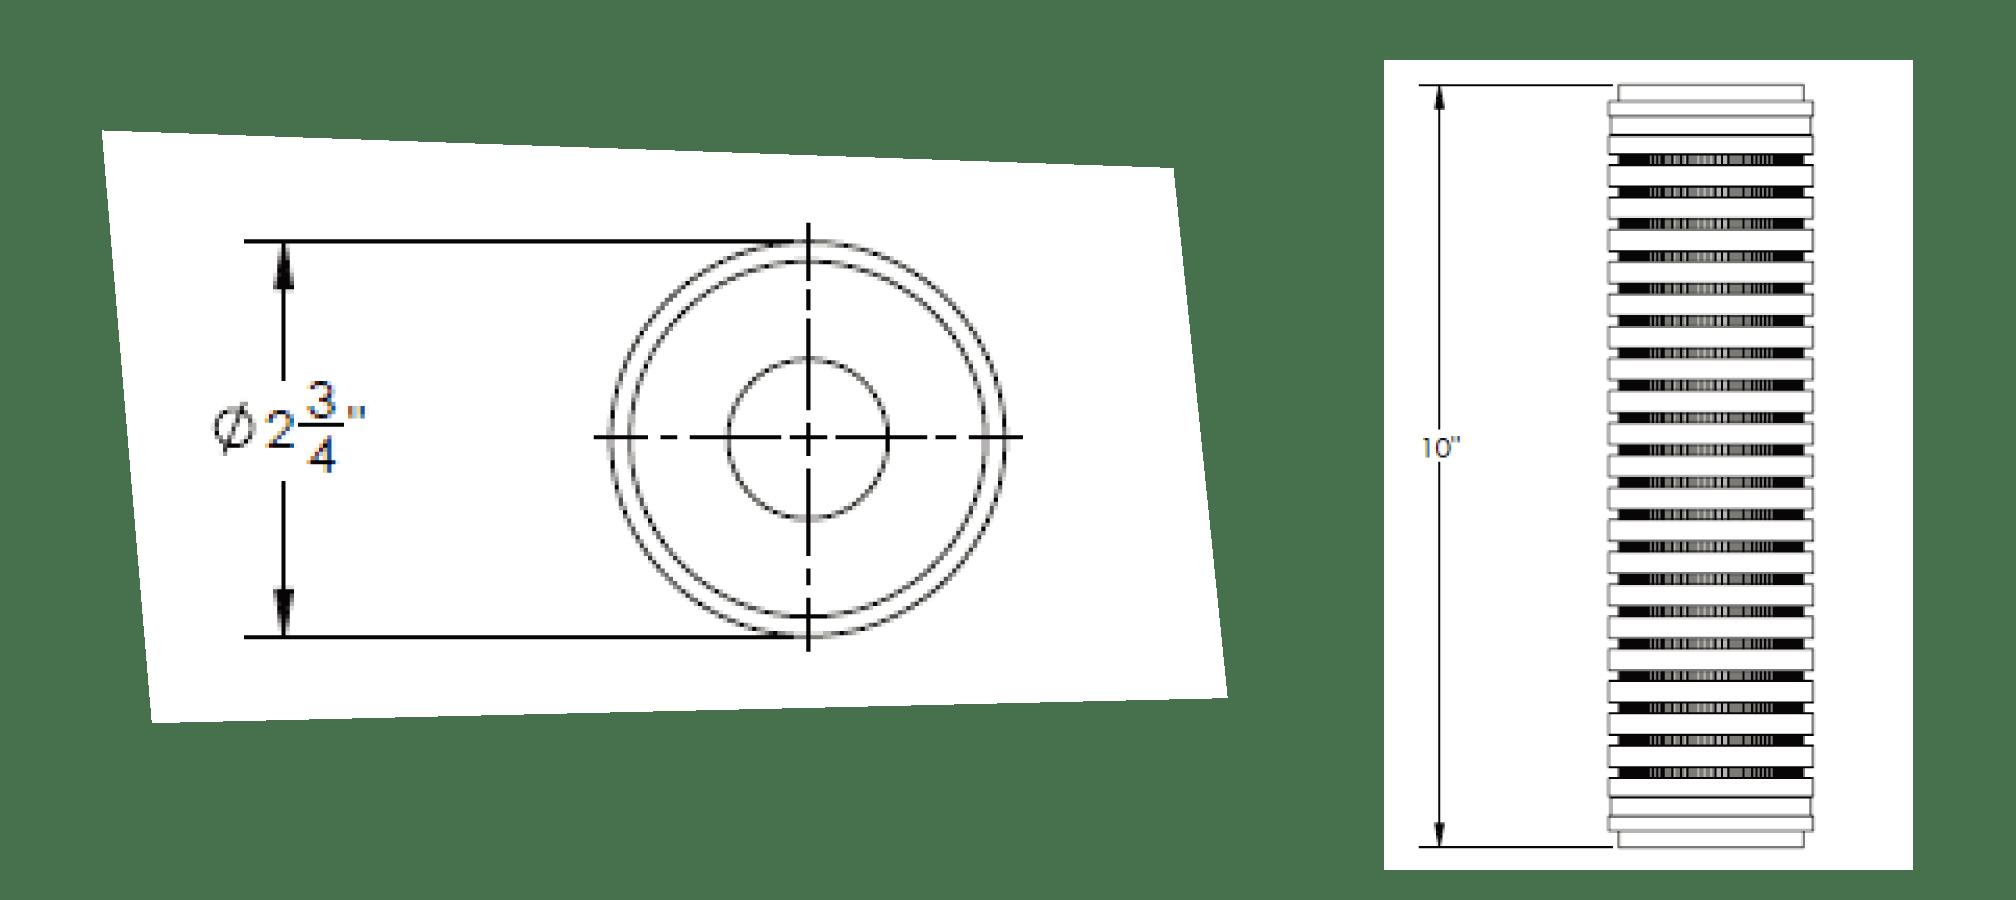 Cim-Tek 31011 1 Micron DEF (Urea) Fused Chemical-Resistant